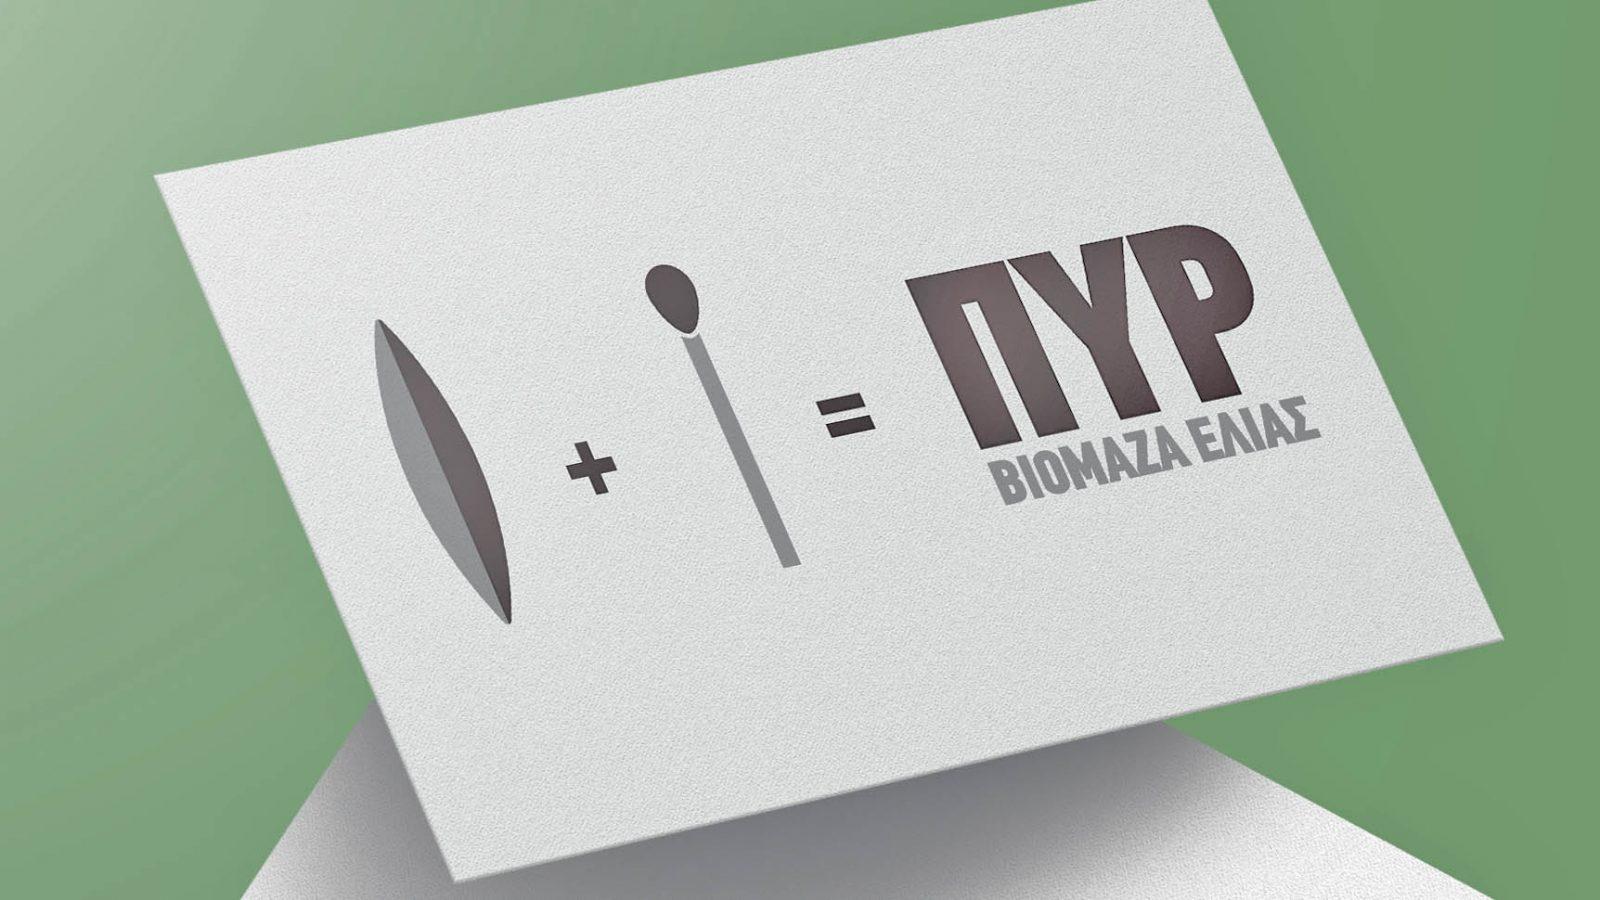 Logo Branding Packaging Illustration Web Σχεδιασμός Λογοτύπου Σχεδιασμός Συσκευασίας Φιορετζης Δημητρης γραφιστας graphic design